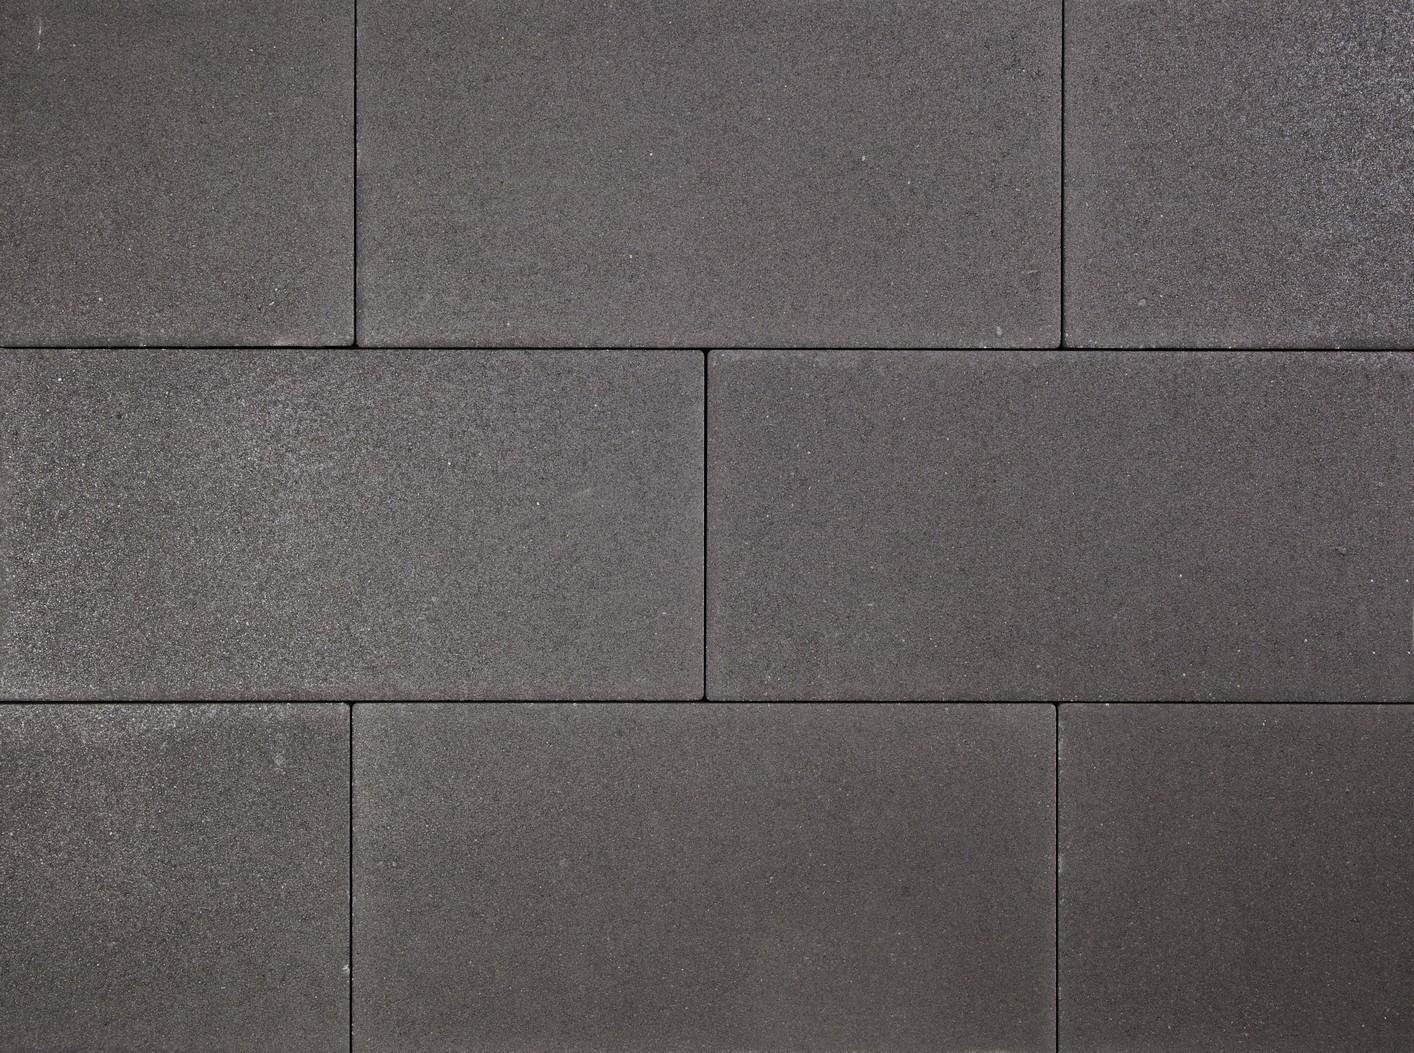 Red Sun Tegels : Smartton smartton se redsun betontegels van harn wekerom